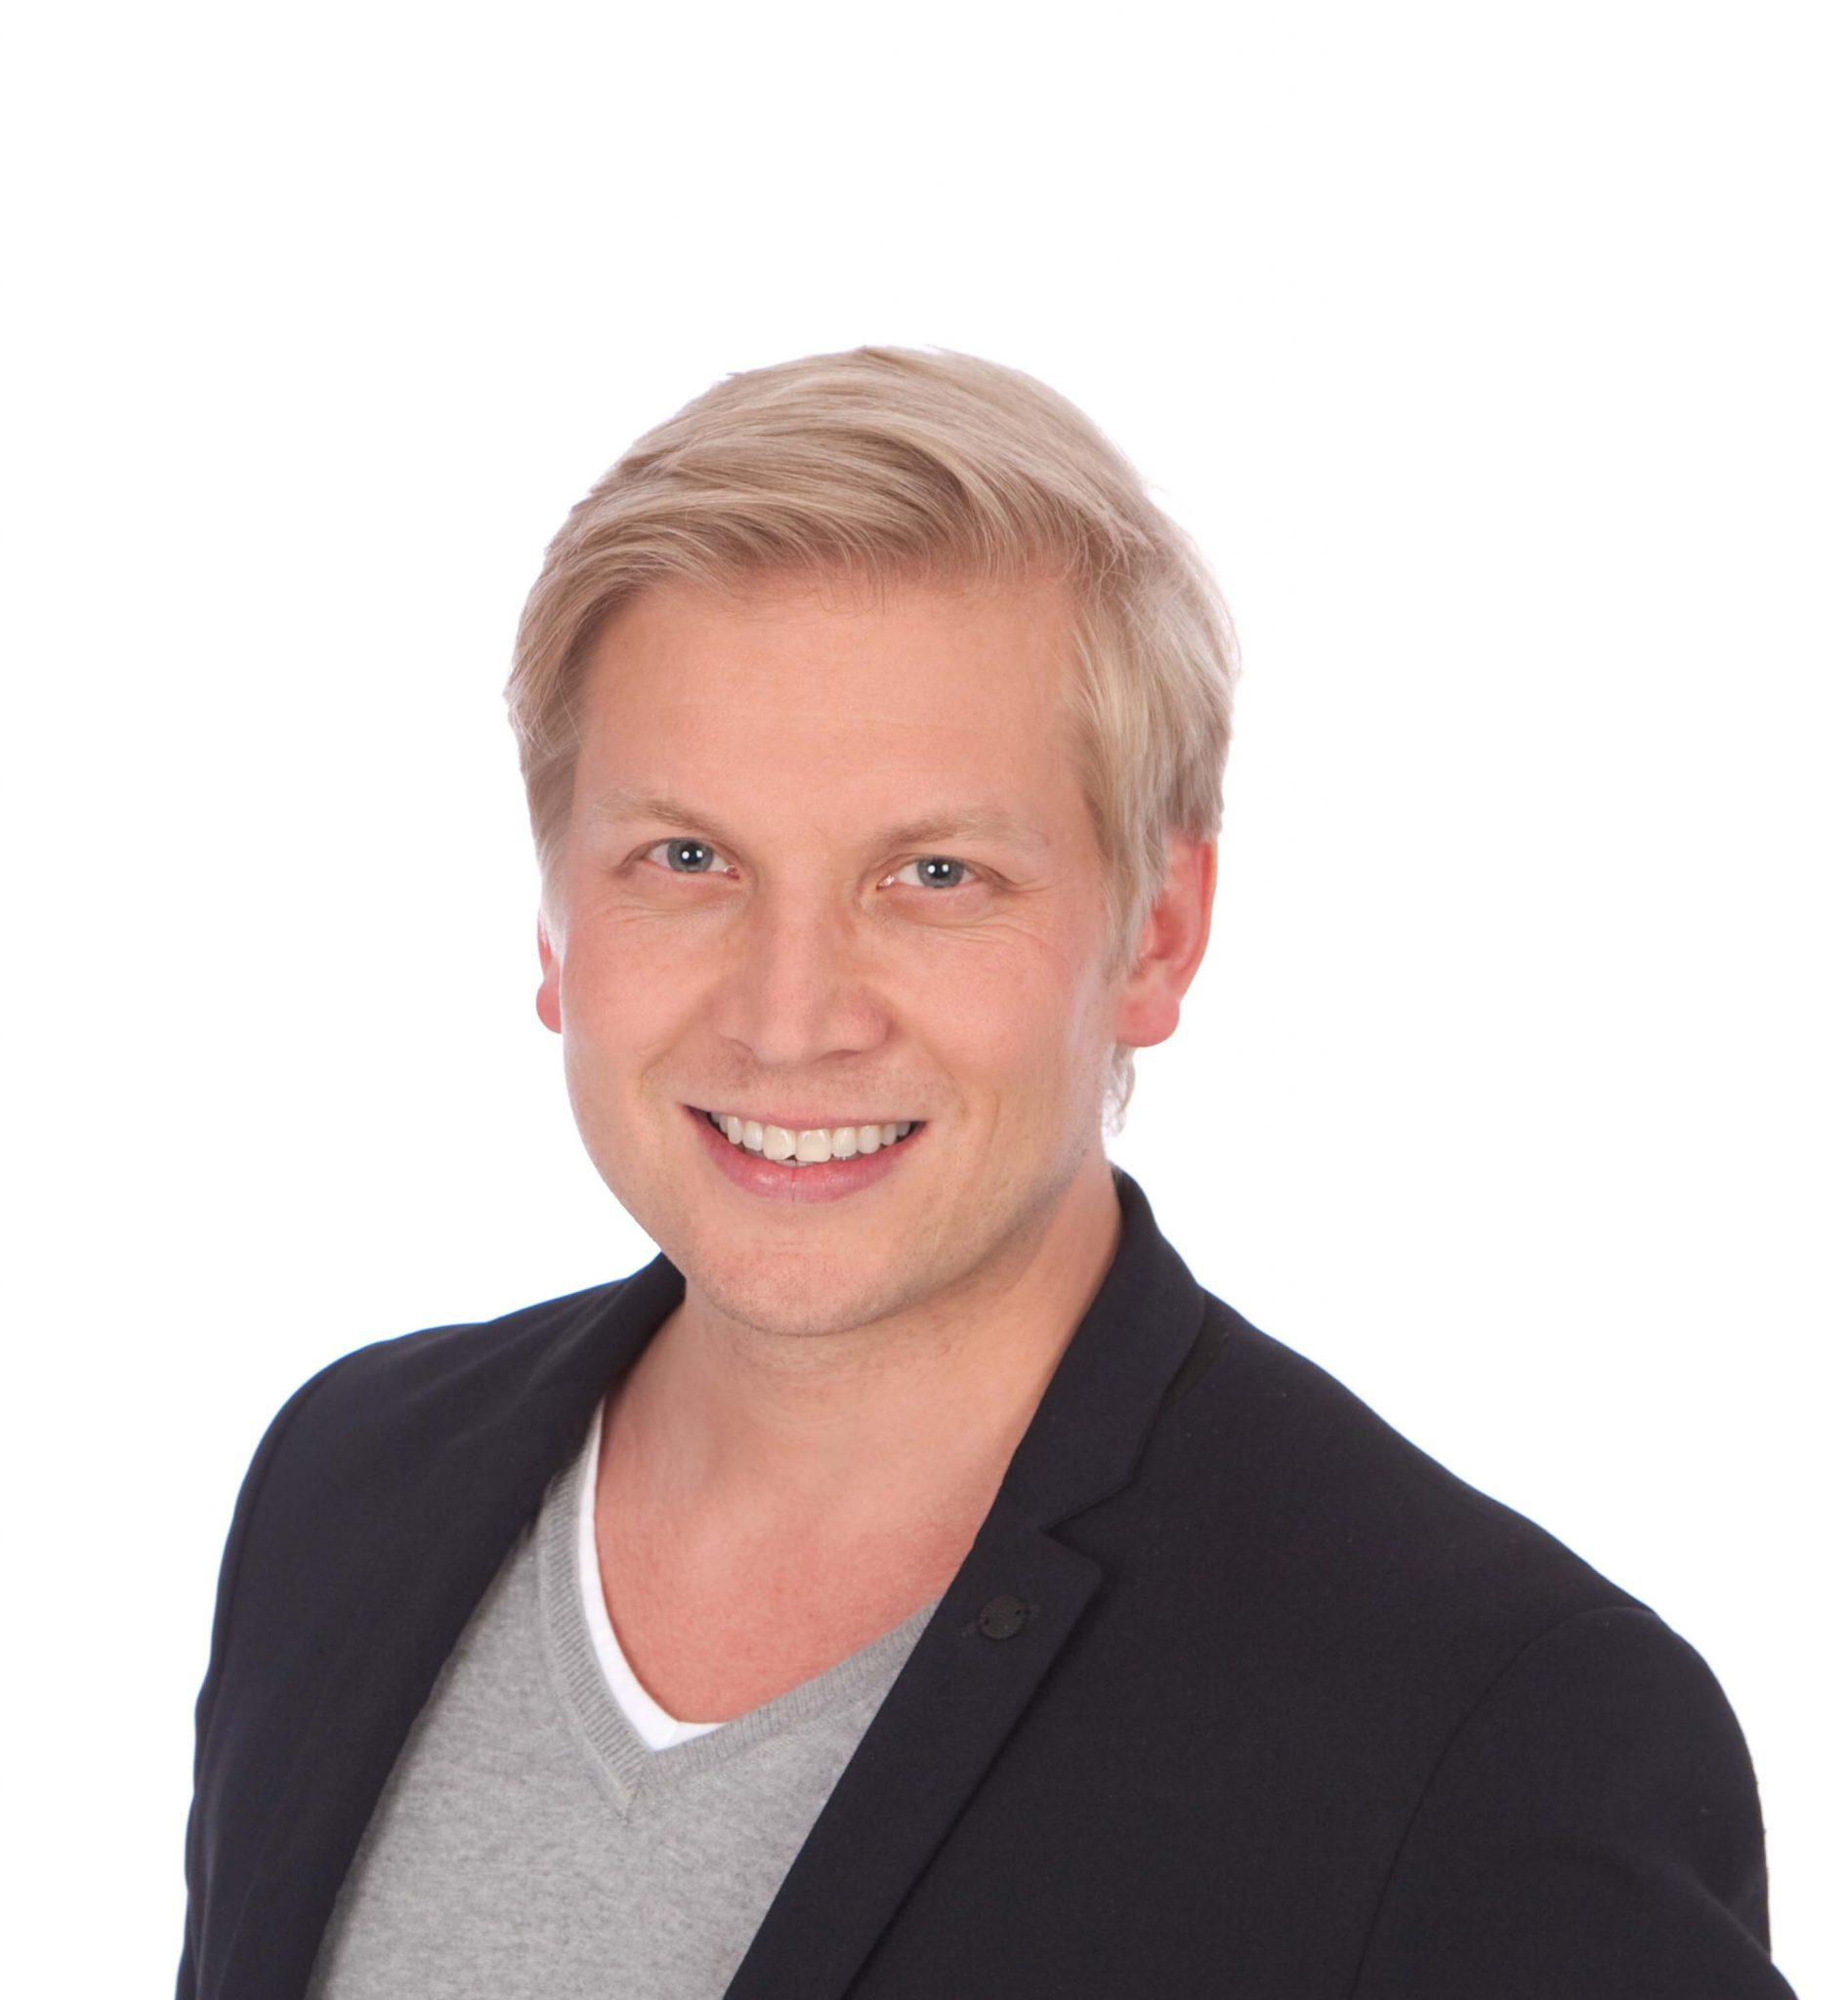 Andreas Rohregger von Smart Learning